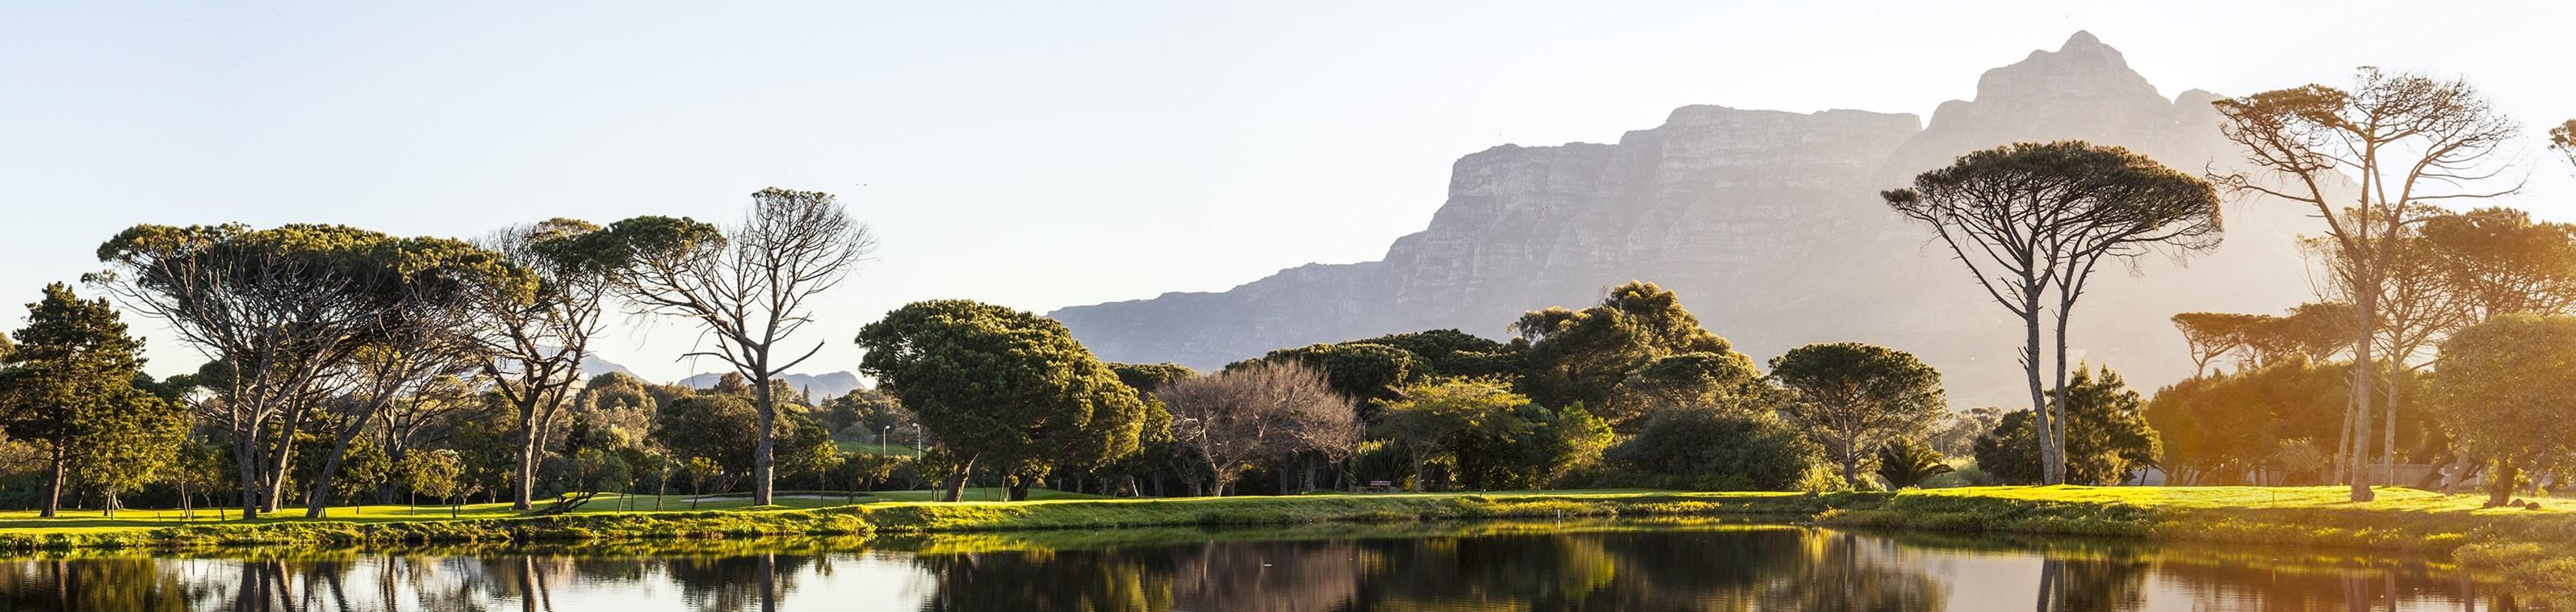 Begeleide rondreis Zuid-Afrika